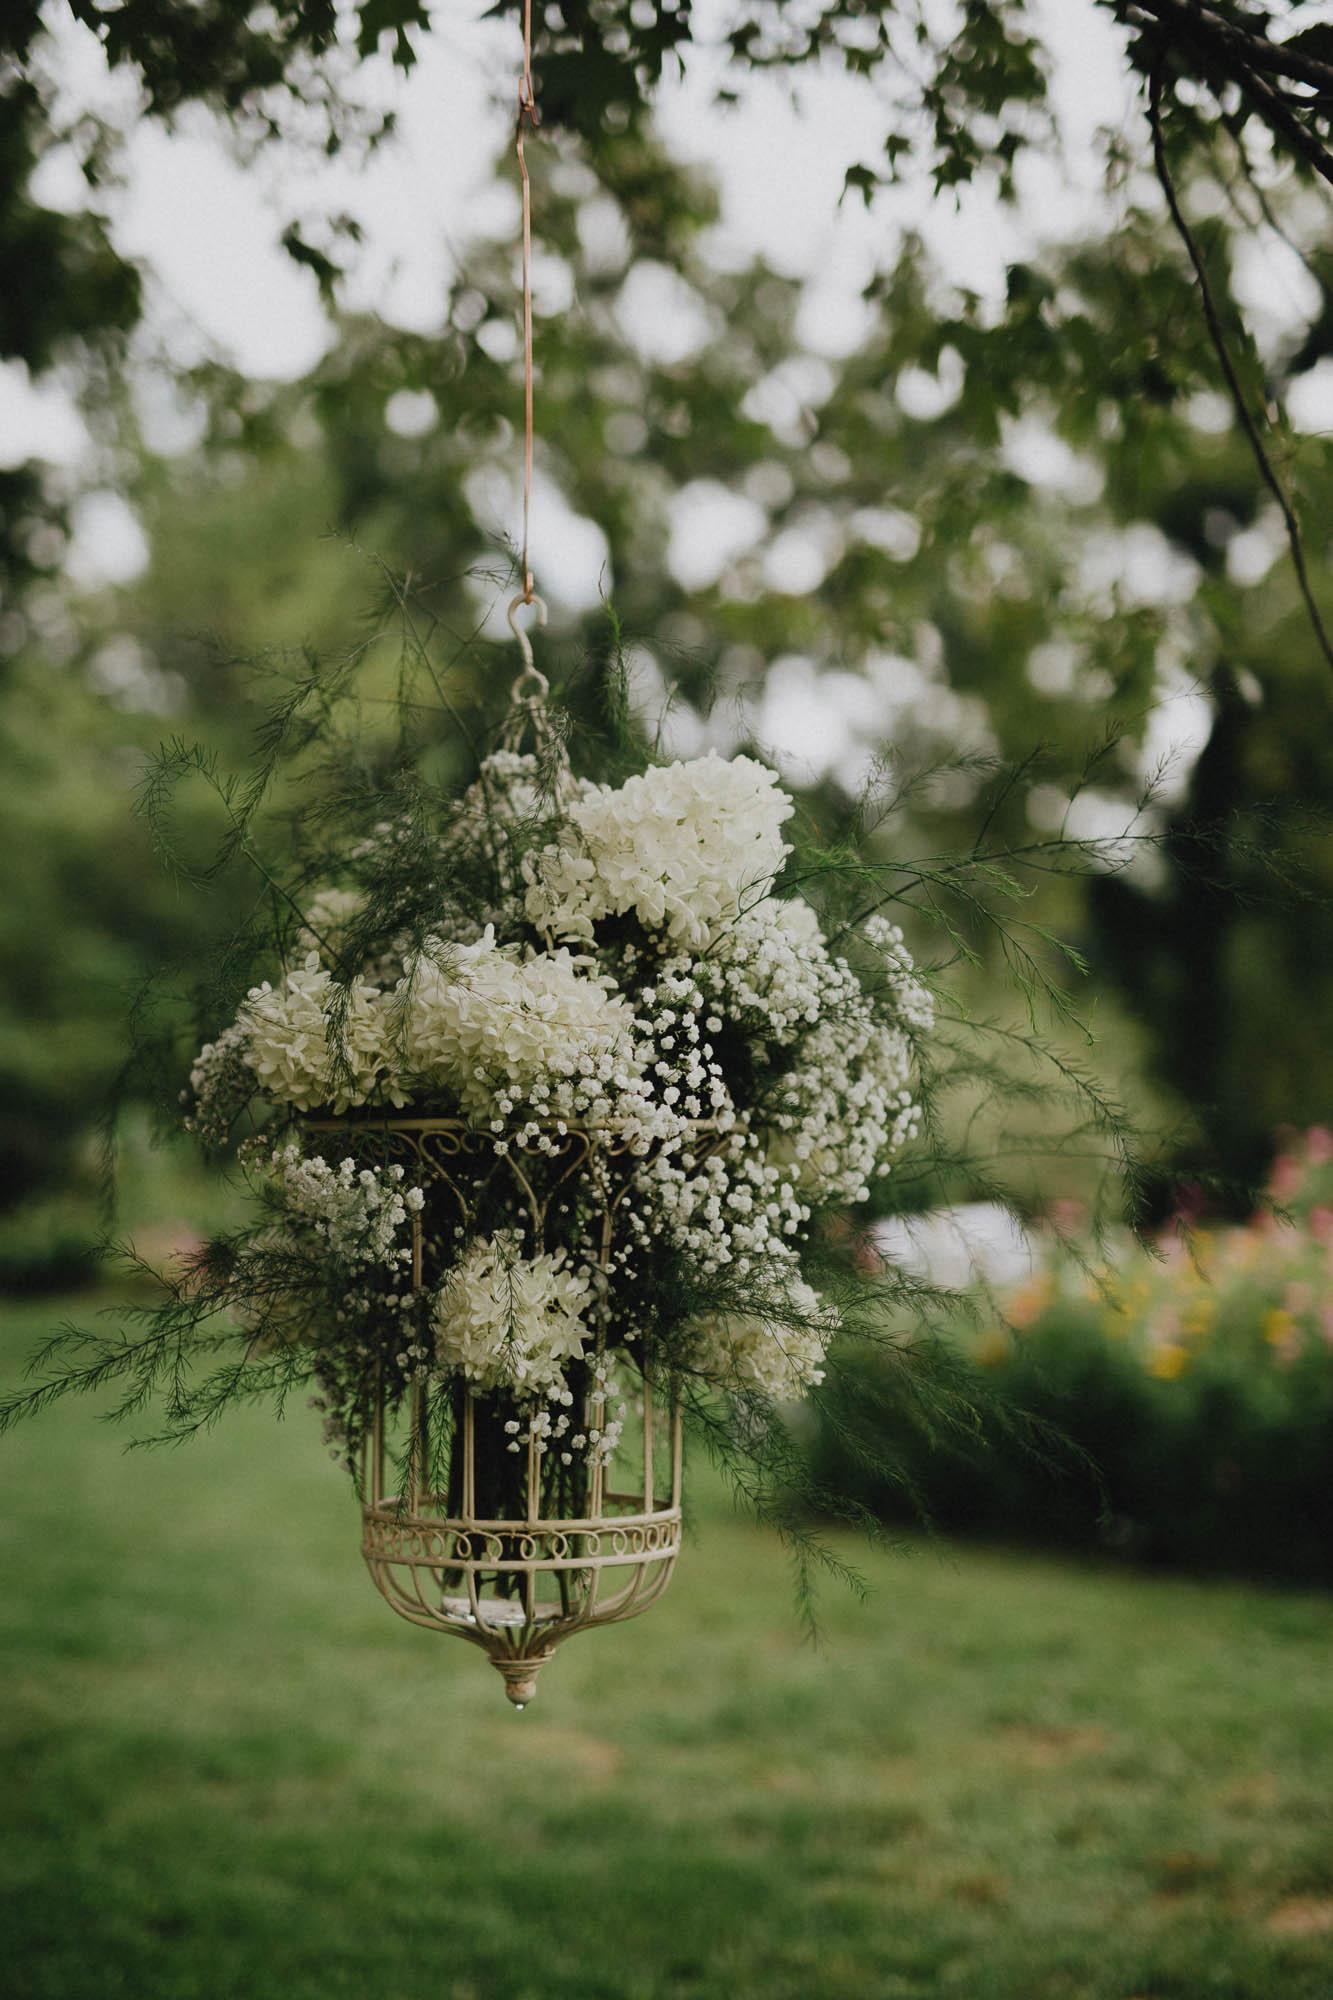 Leah-Graham-Outdoor-DIY-Michigan-Wedding-Details-002@2x.jpg